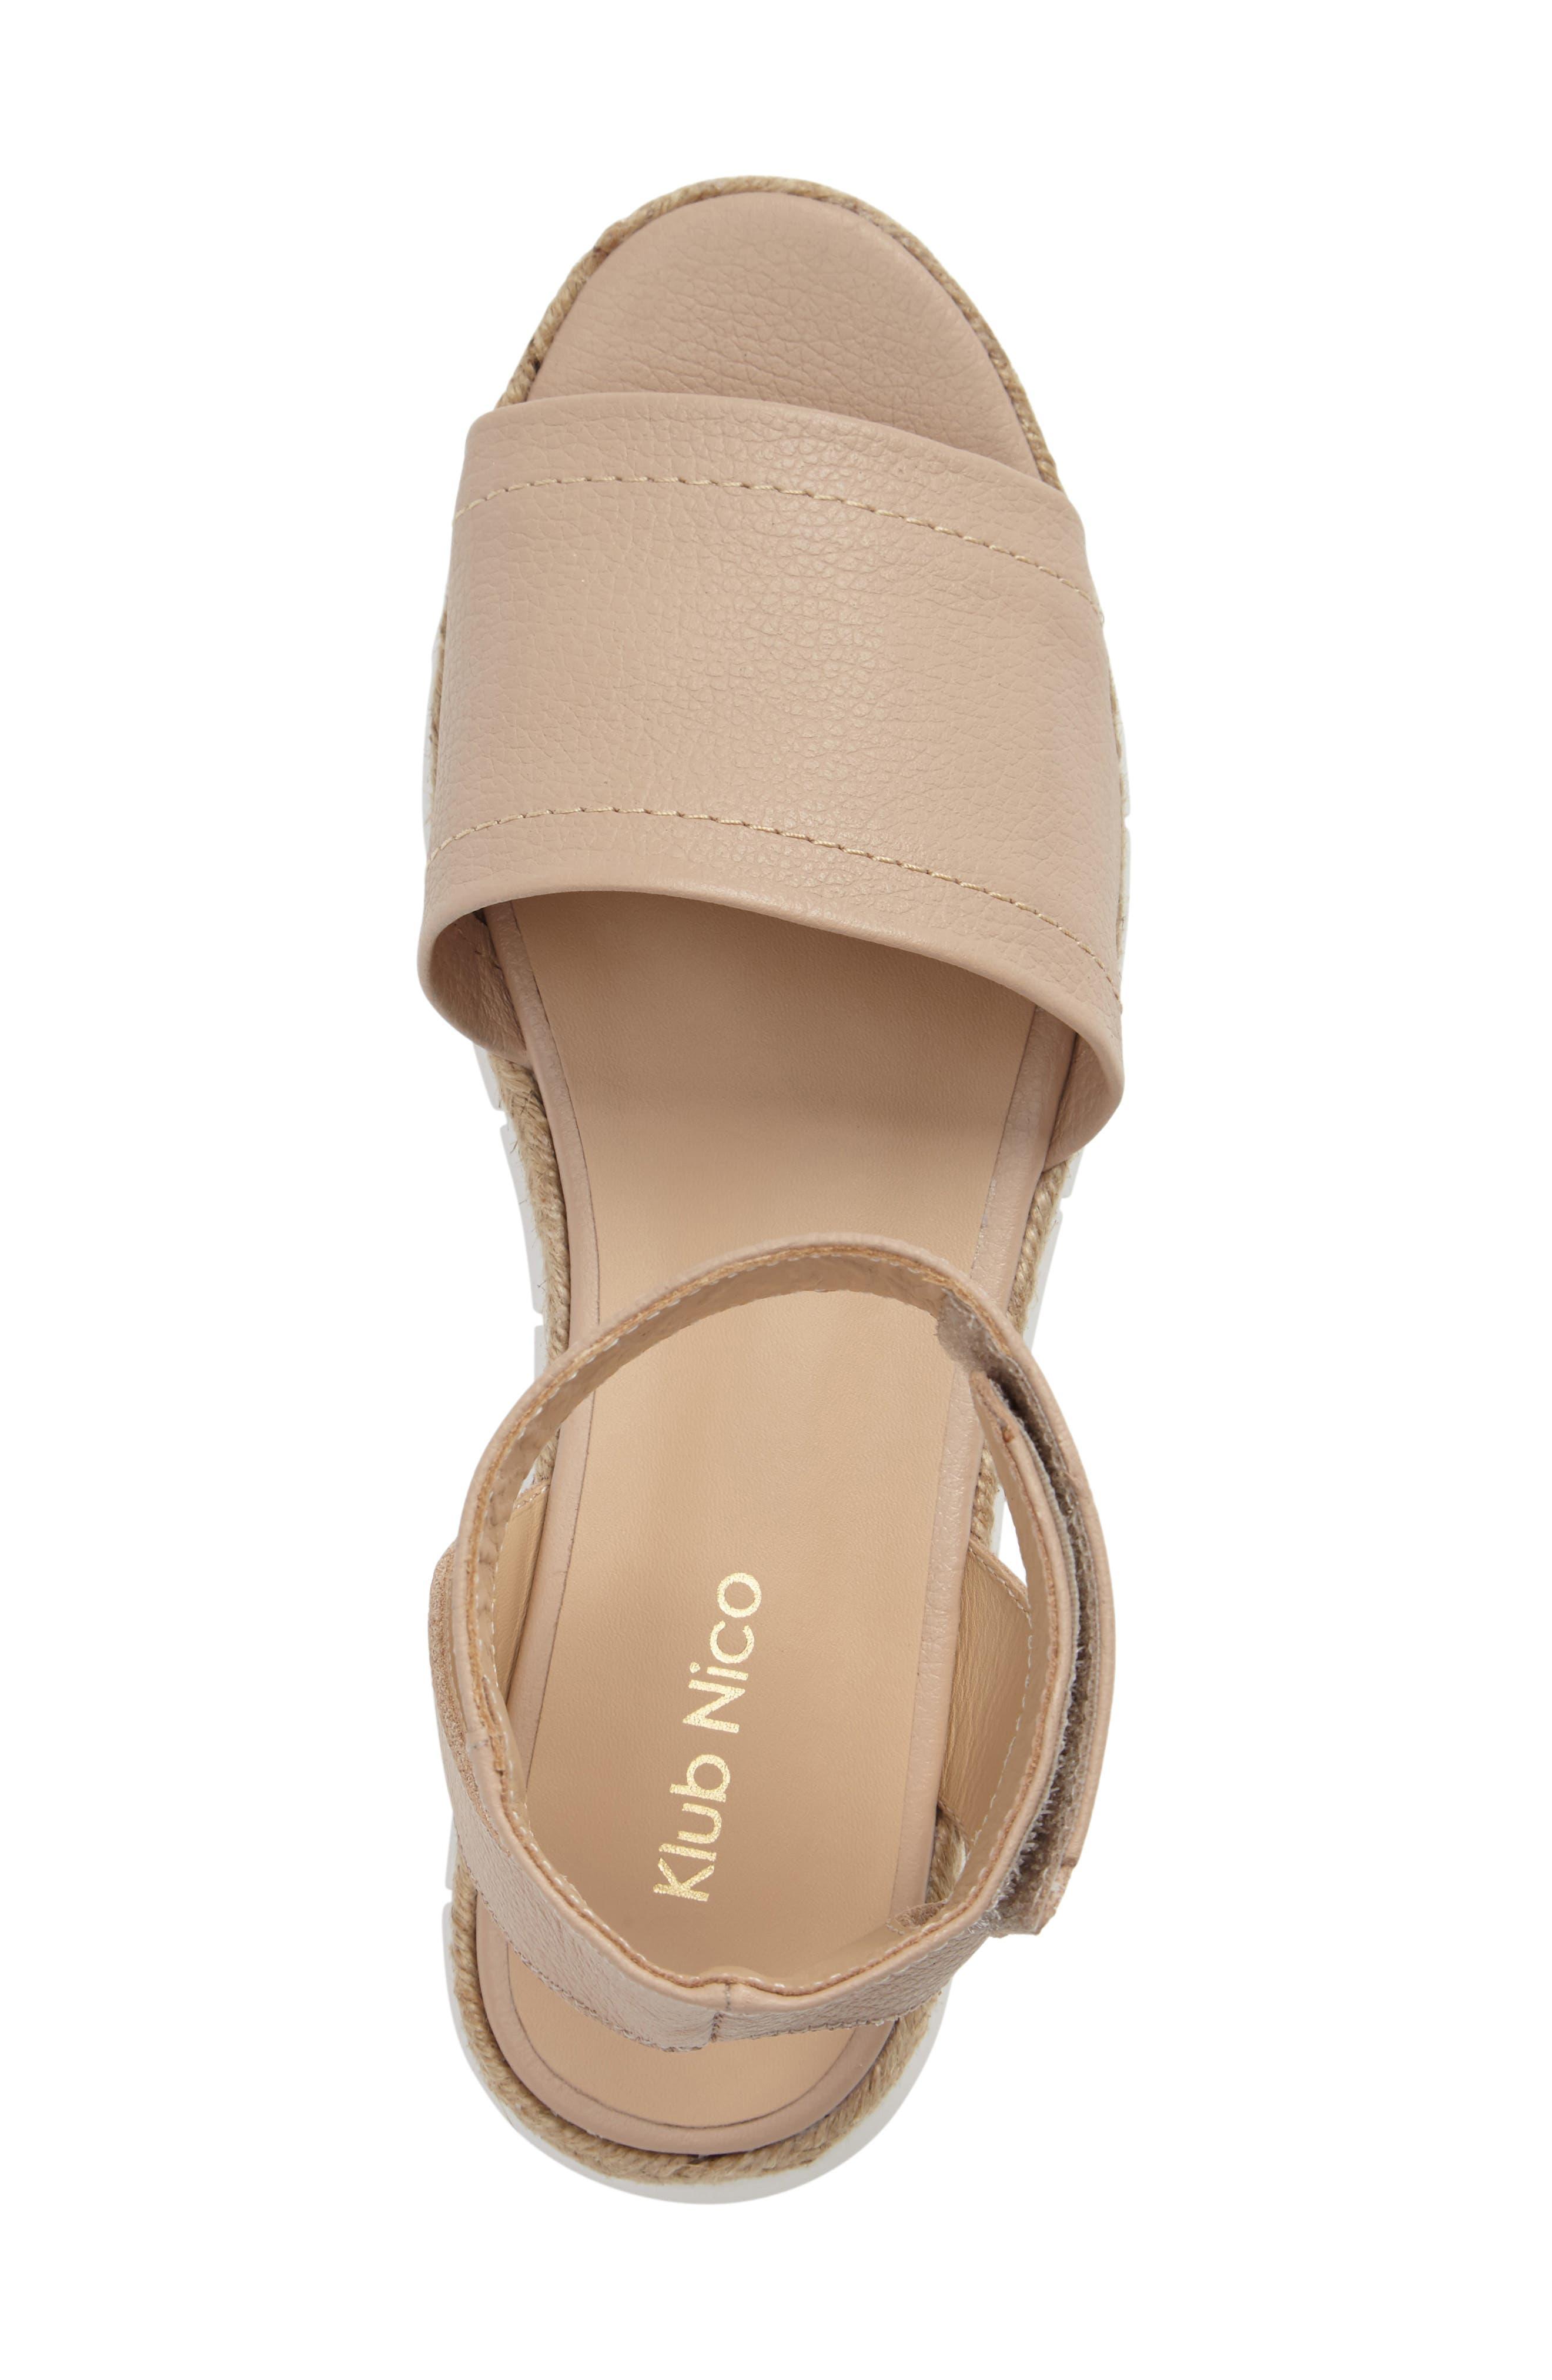 Cleo Platform Sandal,                             Alternate thumbnail 12, color,